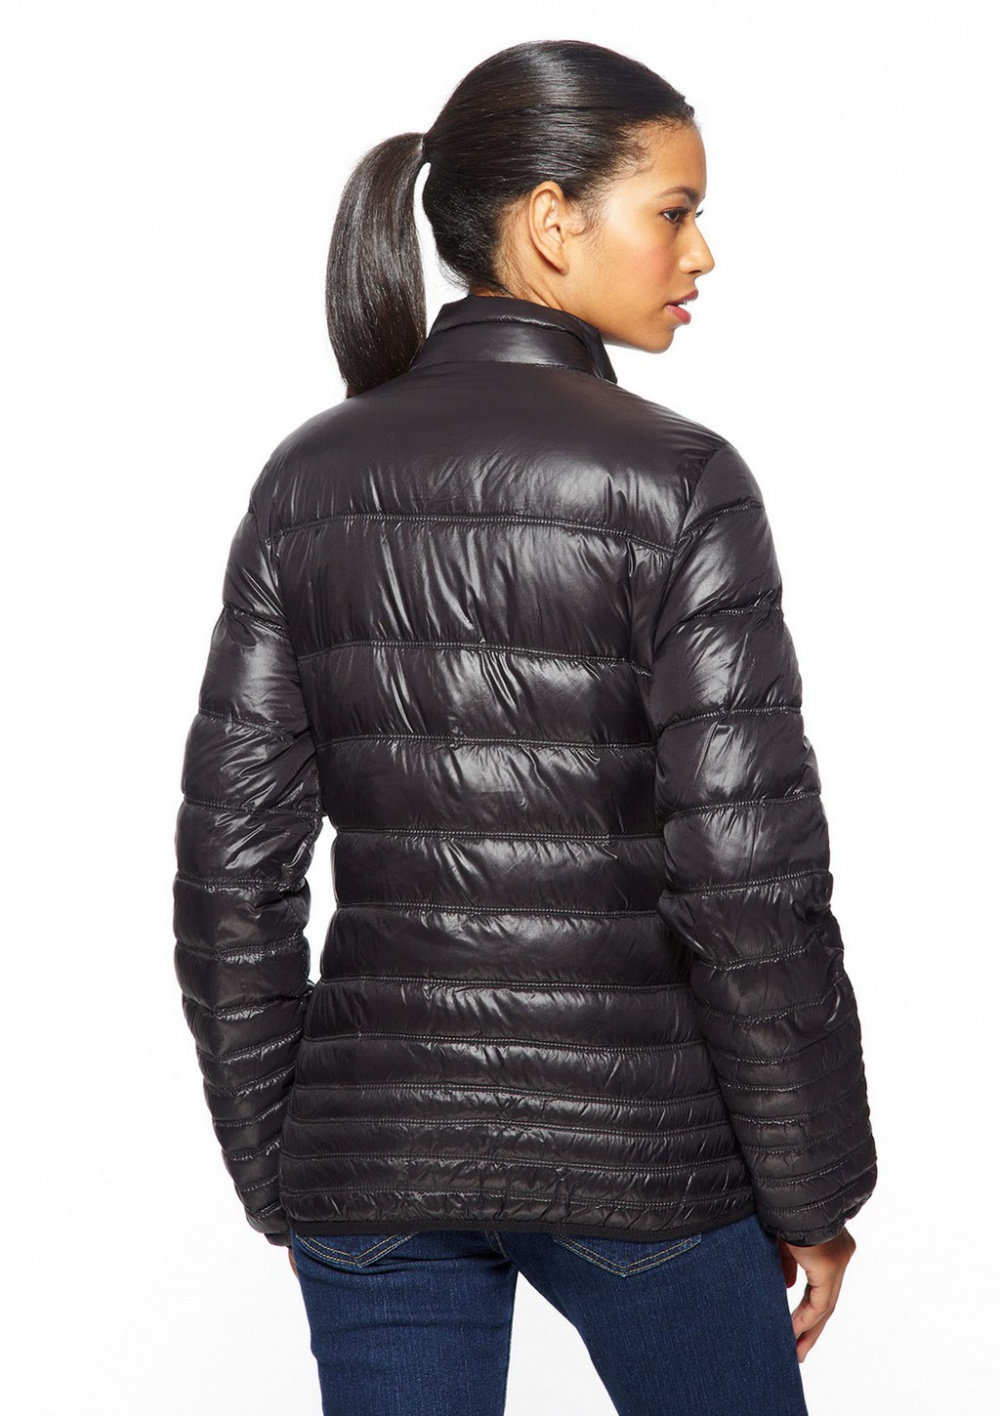 Куртка деми Hemisphere, размер L. Новая